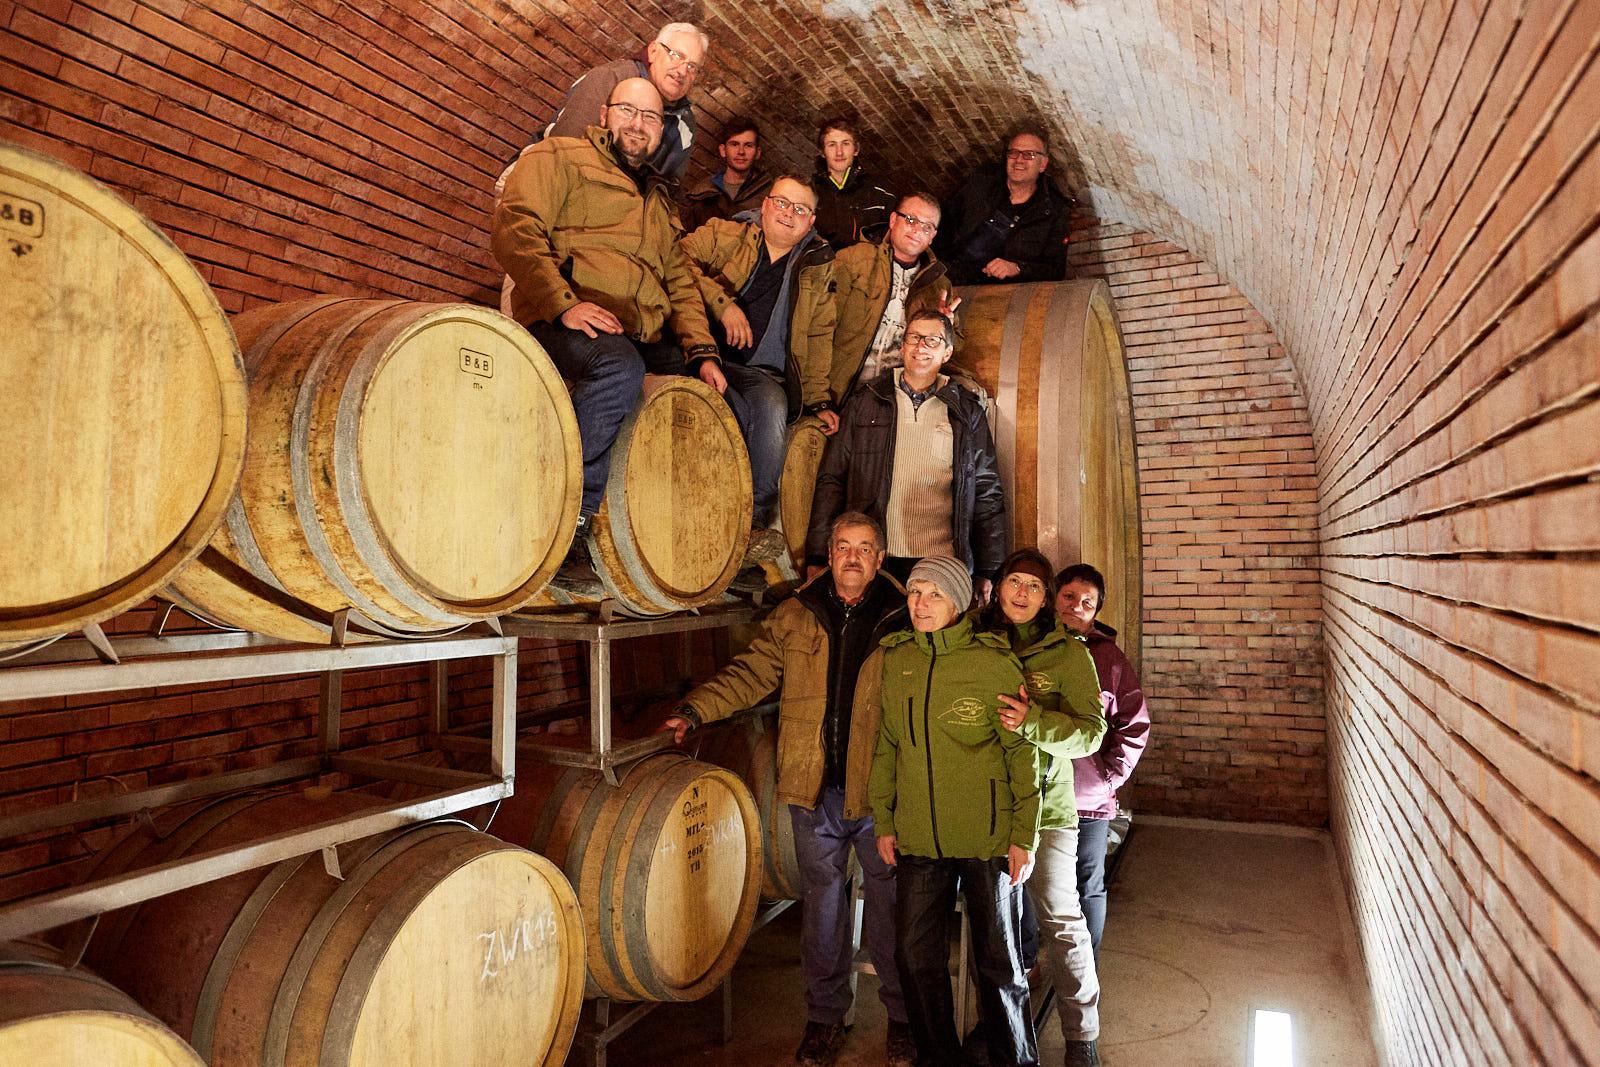 weingut norbert bauer winemakers near wooden barrels inside wine cellar